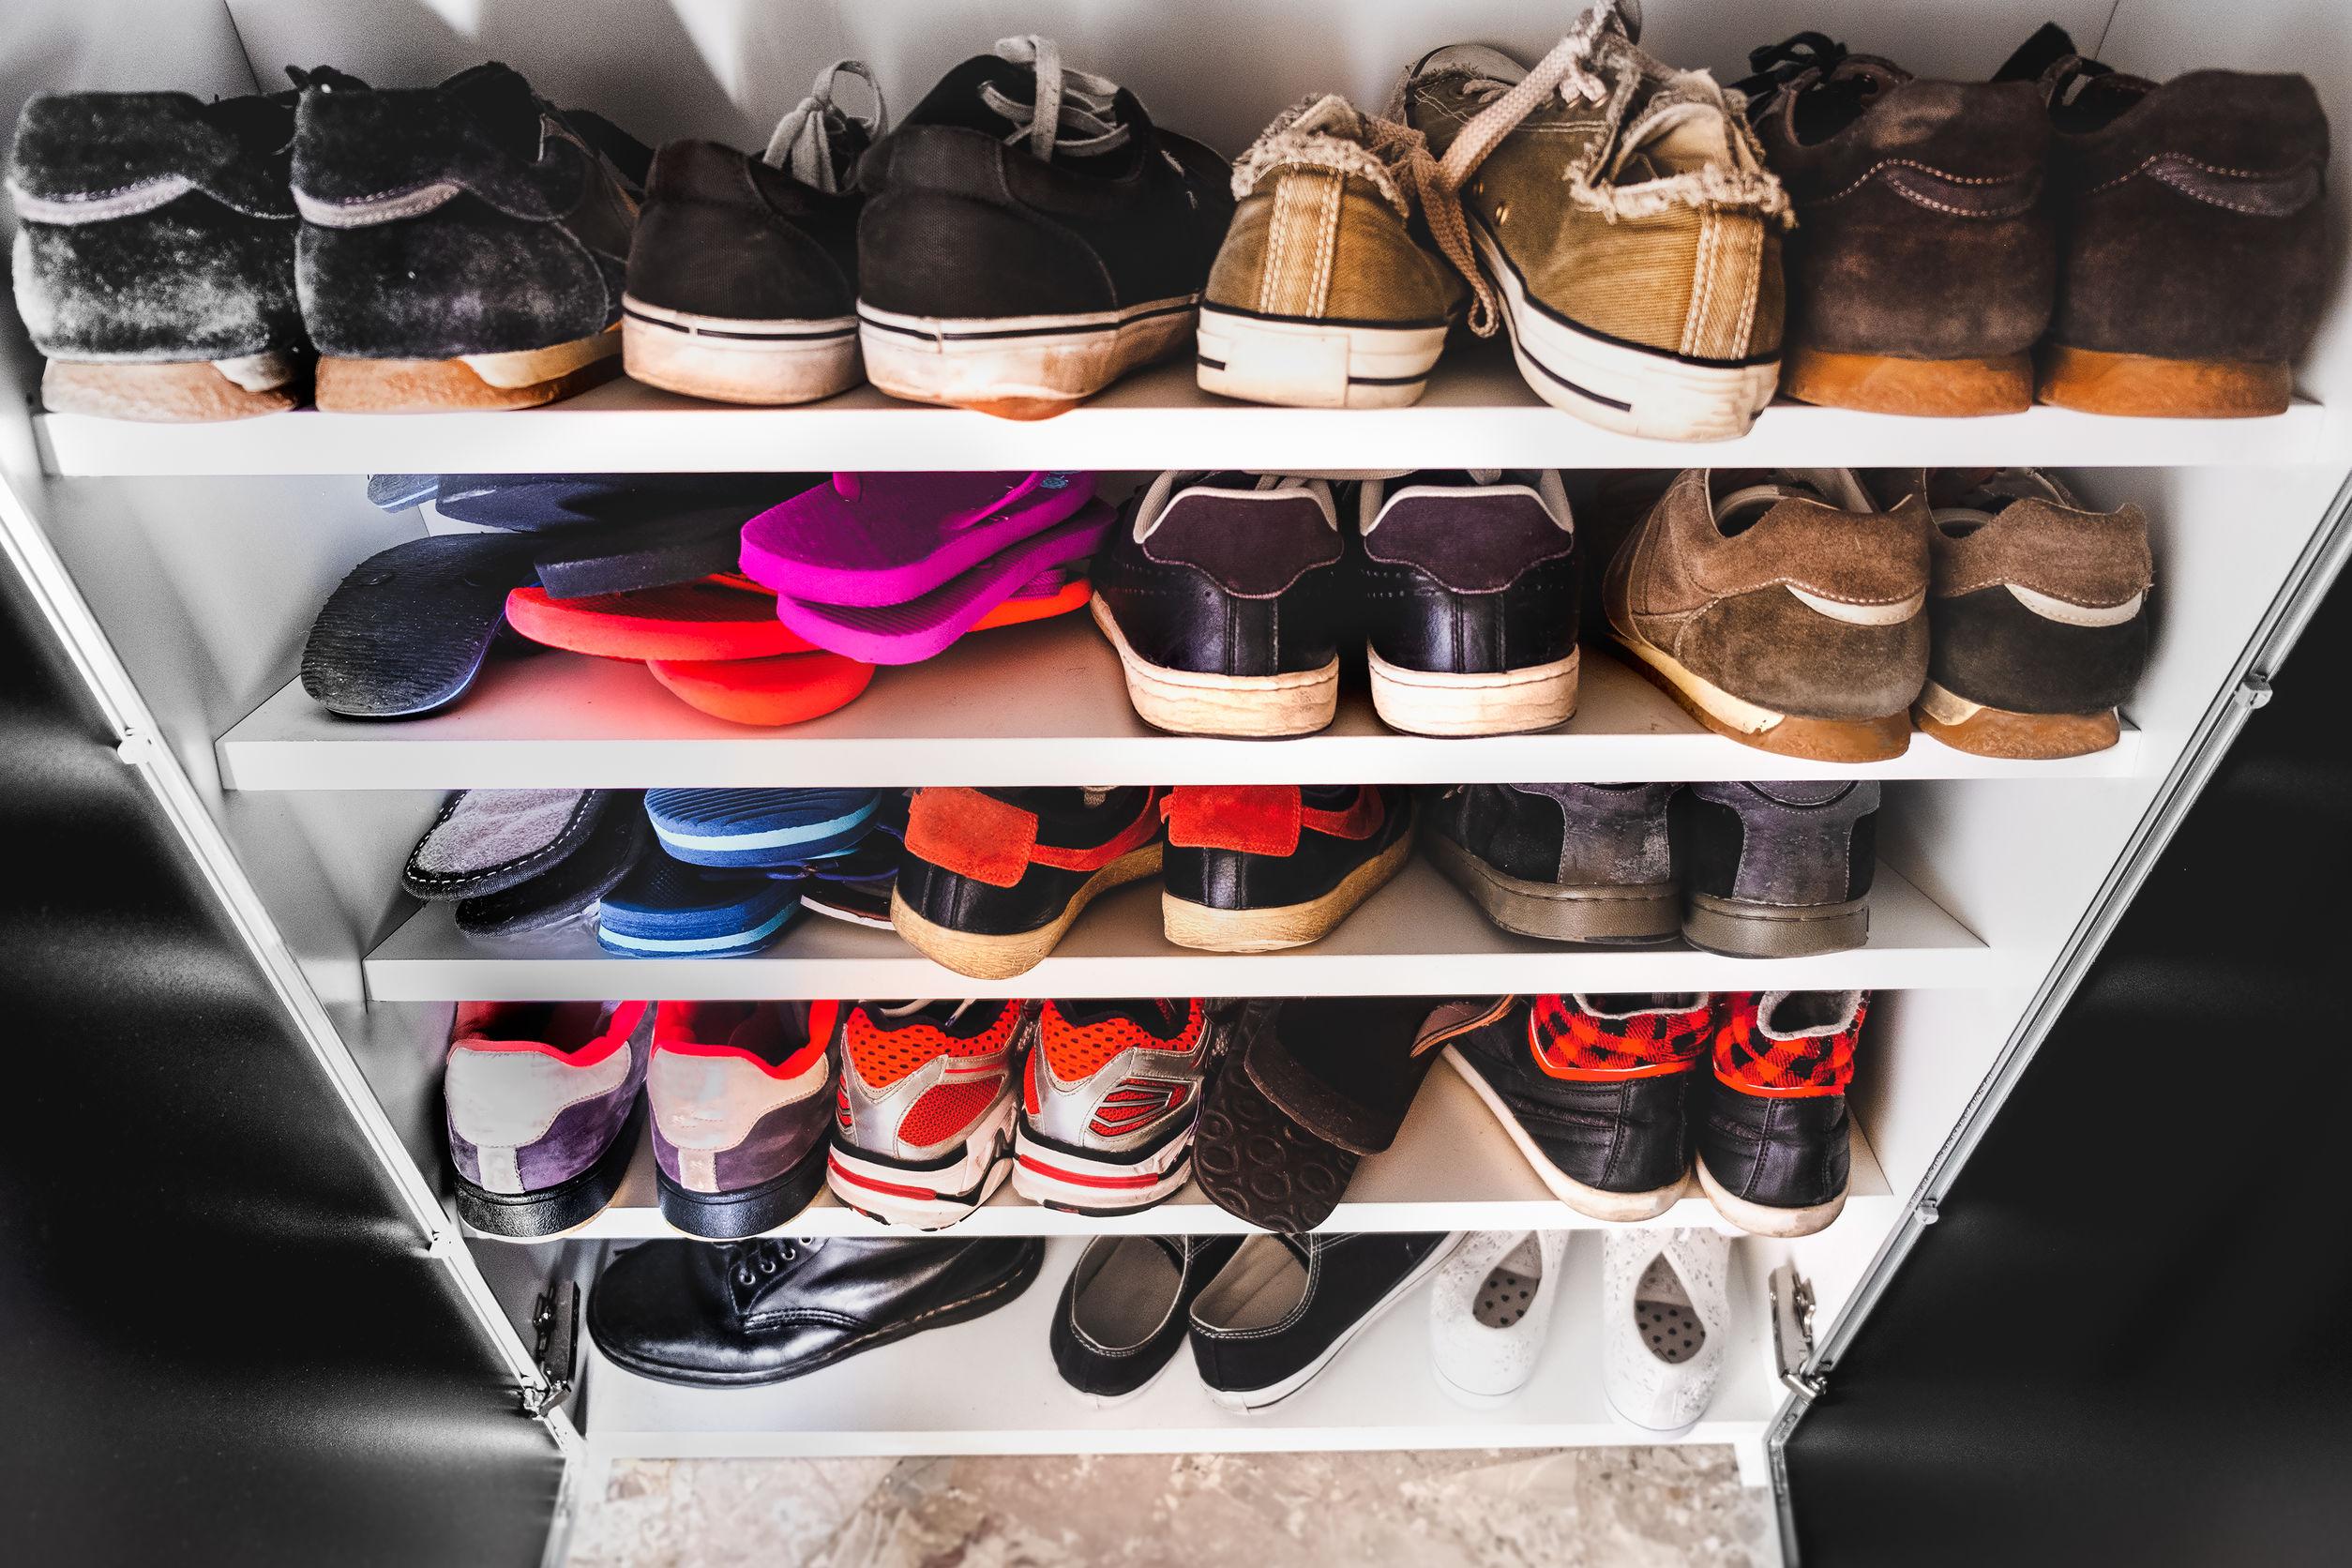 imagen de otganizador de zapatos